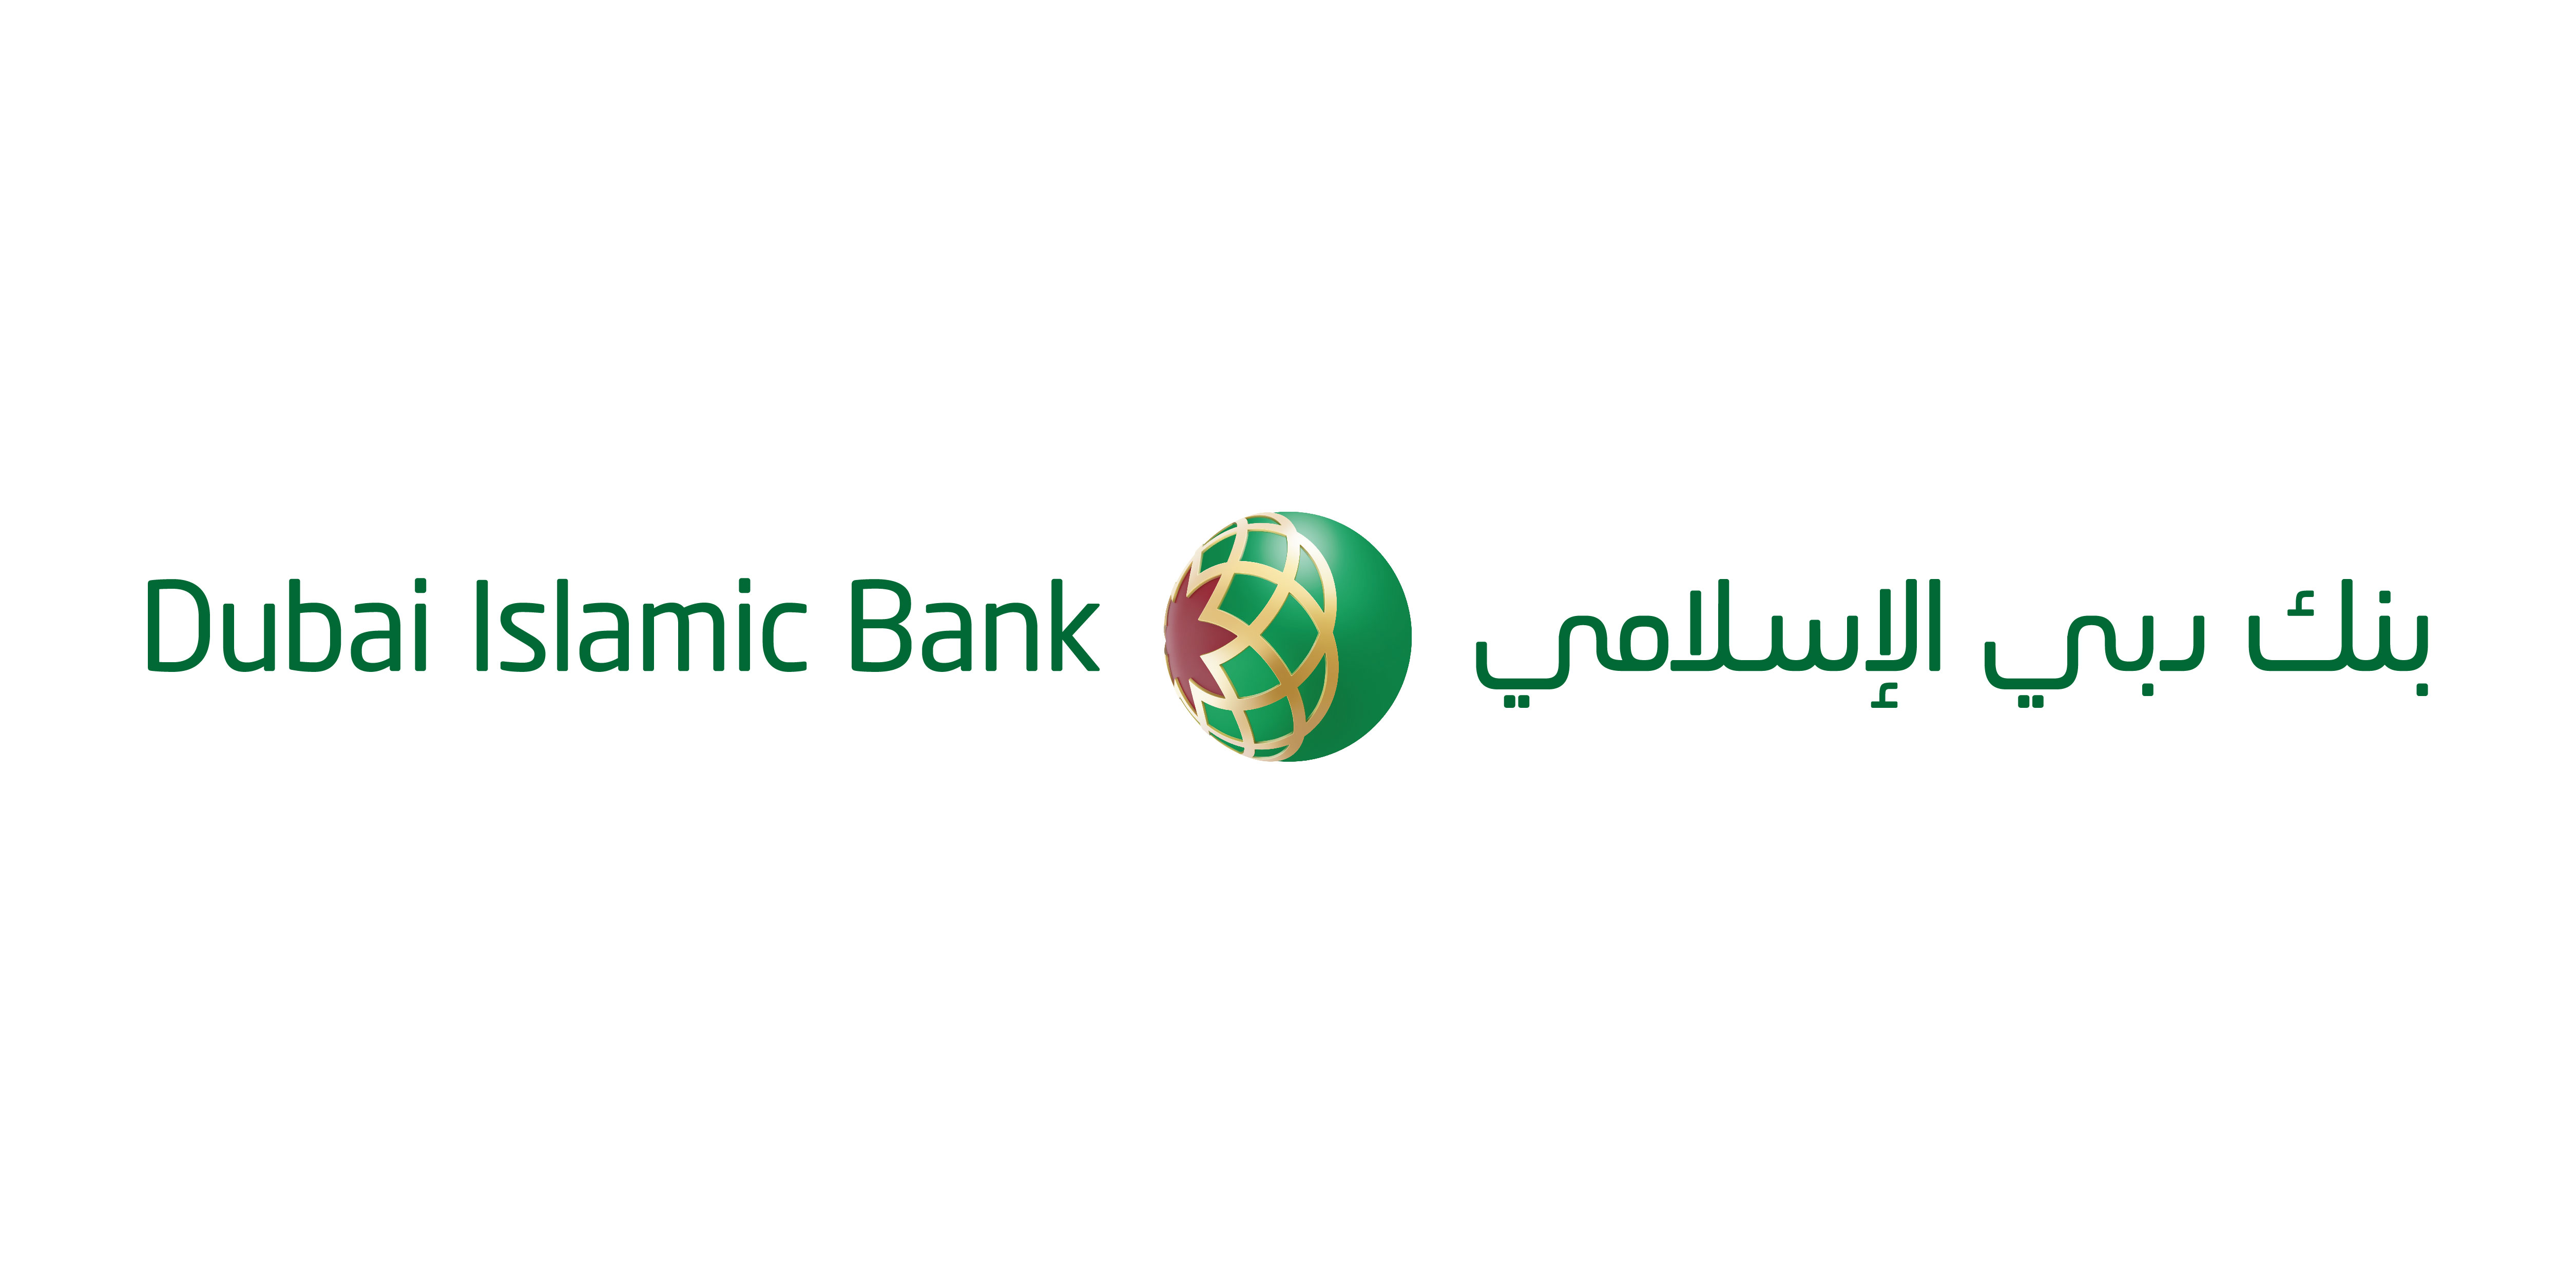 Photo of عروض بنك دبي الإسلامي لموسم العودة إلى المدارس